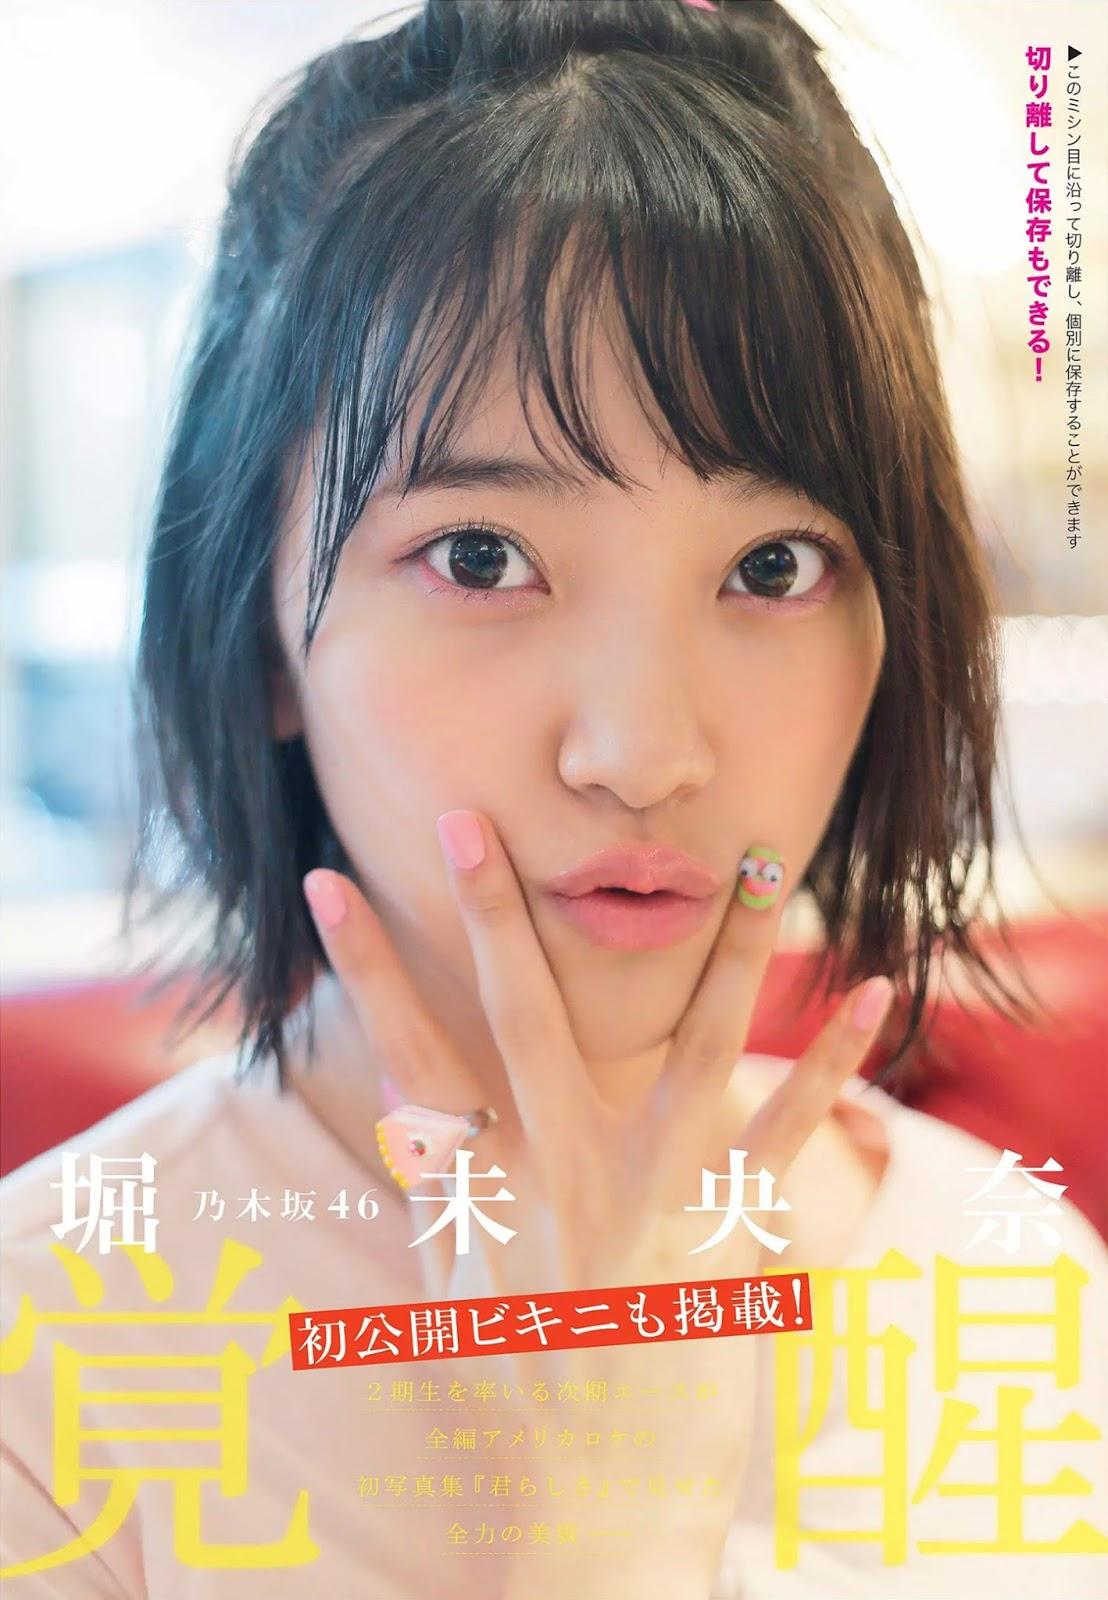 Hori Miona 堀未央奈, FLASH 電子版 2017.12.12 (フラッシュ 2017年12月12日号)